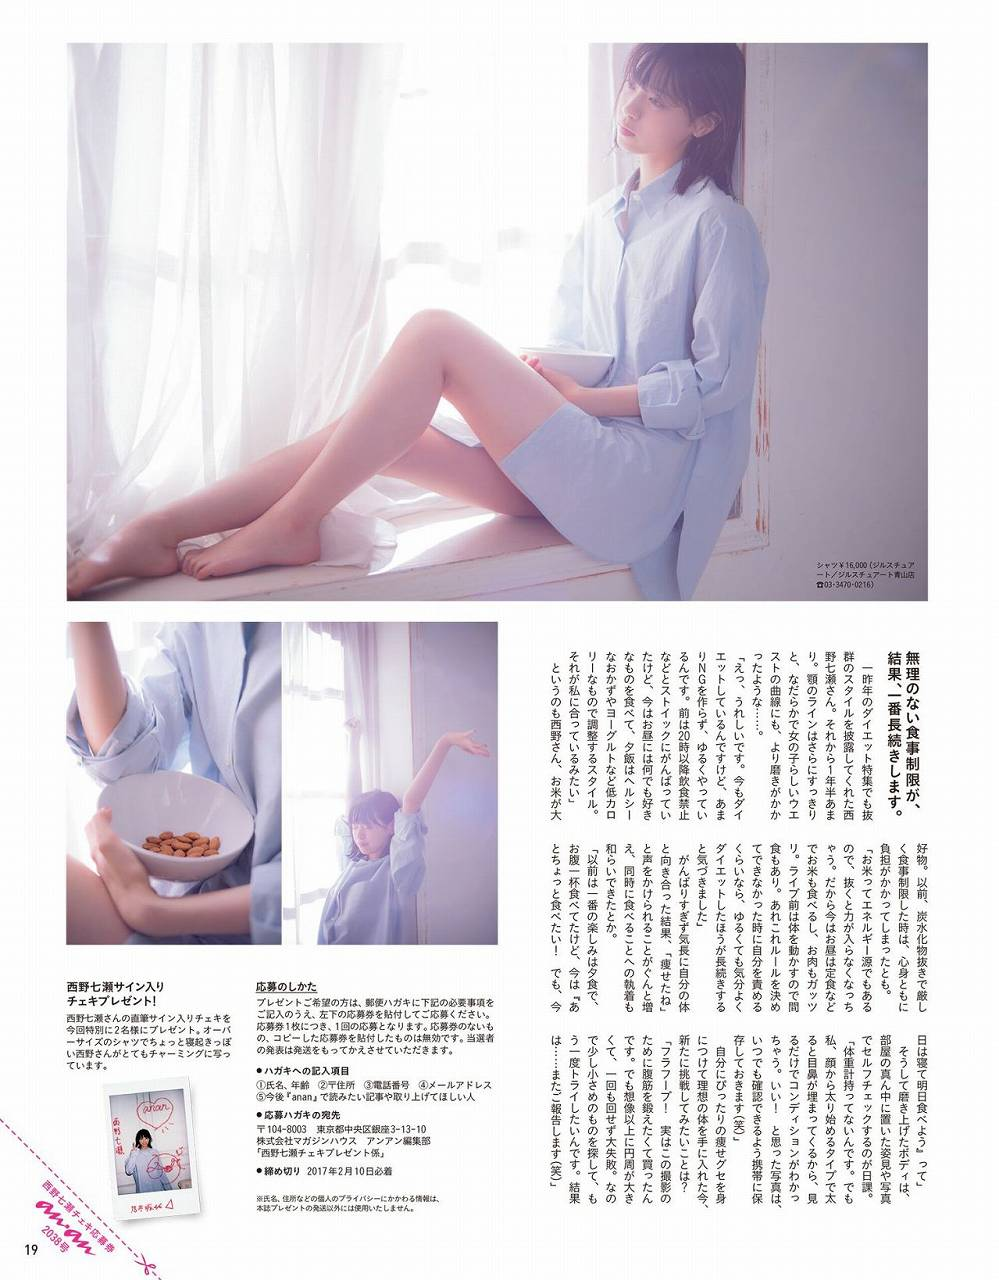 「anan (アンアン) 2017年 2月1日号」西野七瀬のグラビア